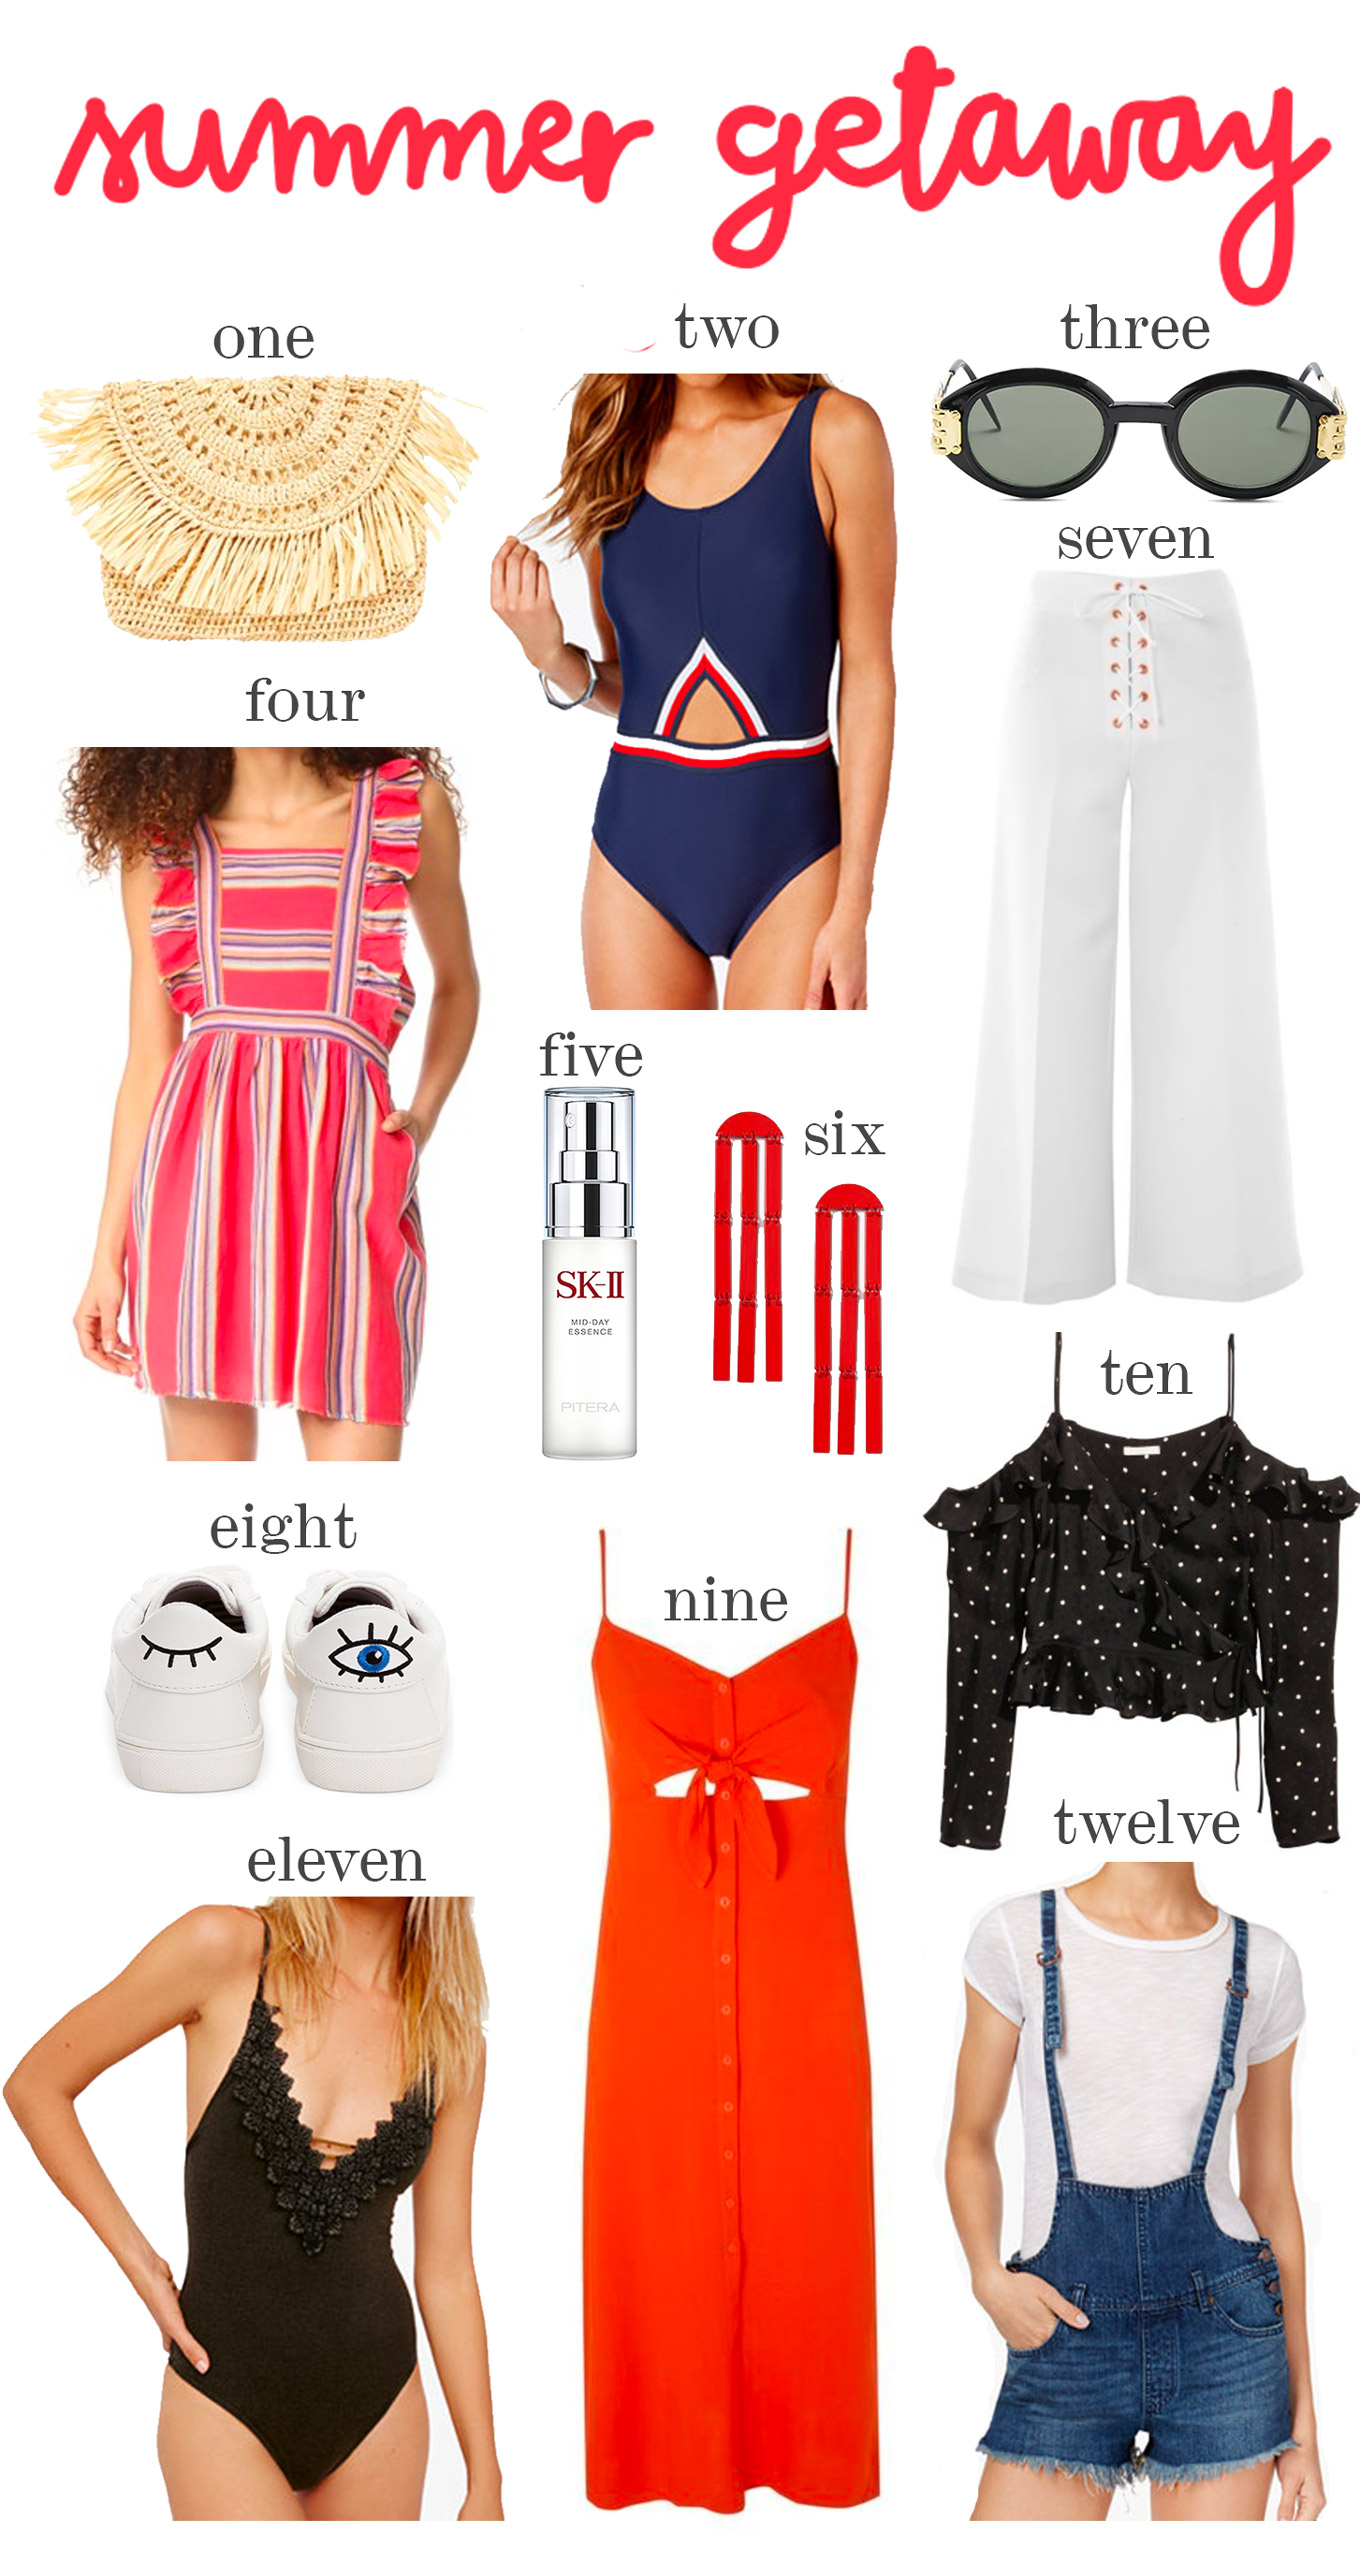 summer getaway essentials